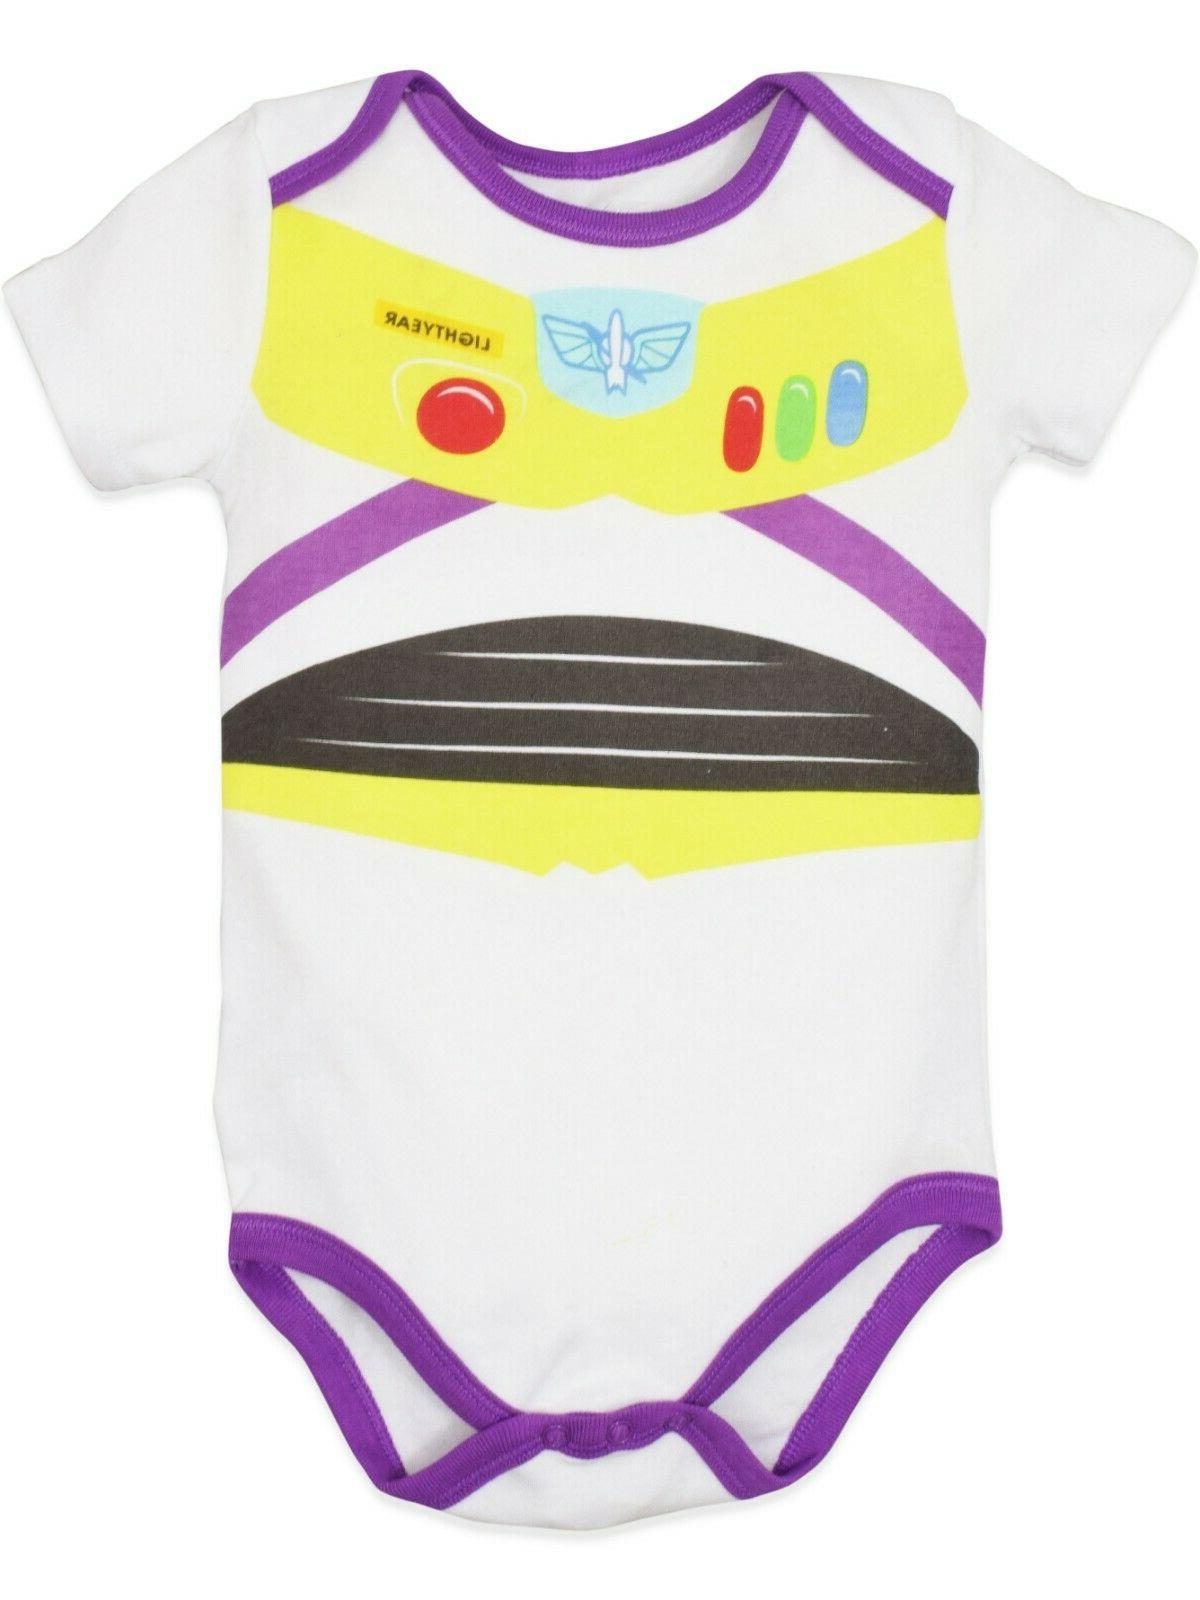 Disney Girl Pack Bodysuits Nemo Buzz Inc.